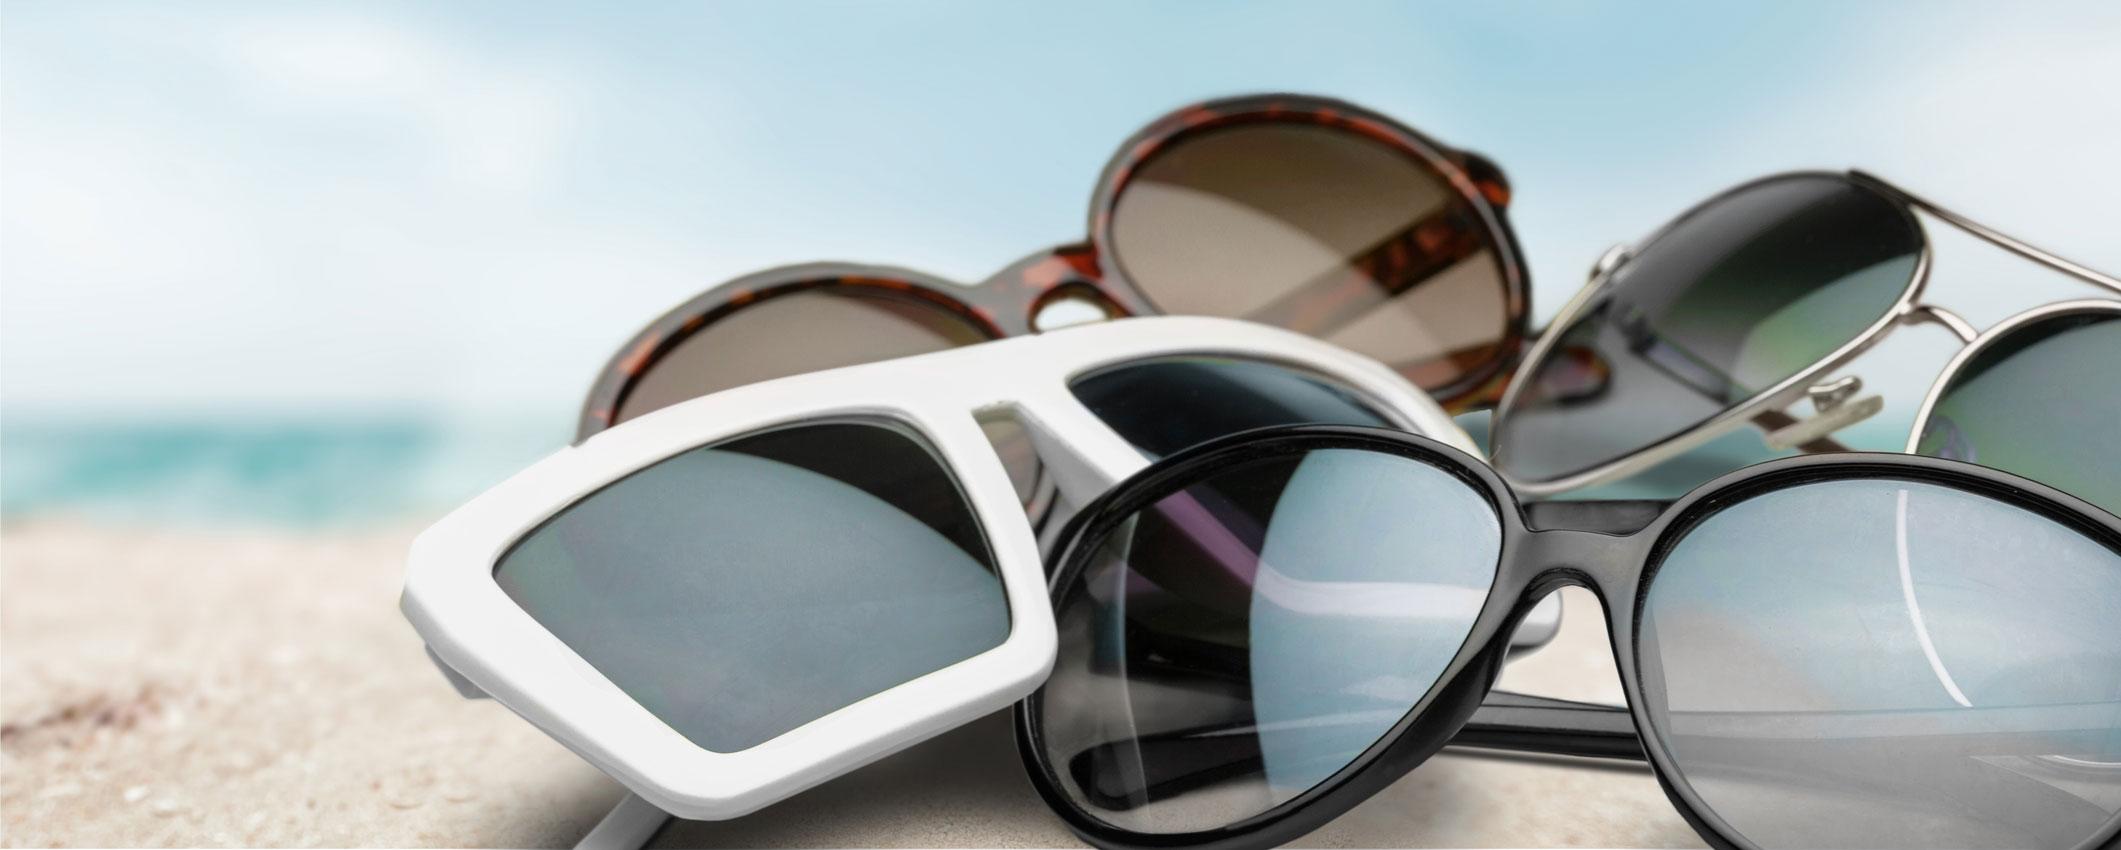 Sunglasses lying on the beach